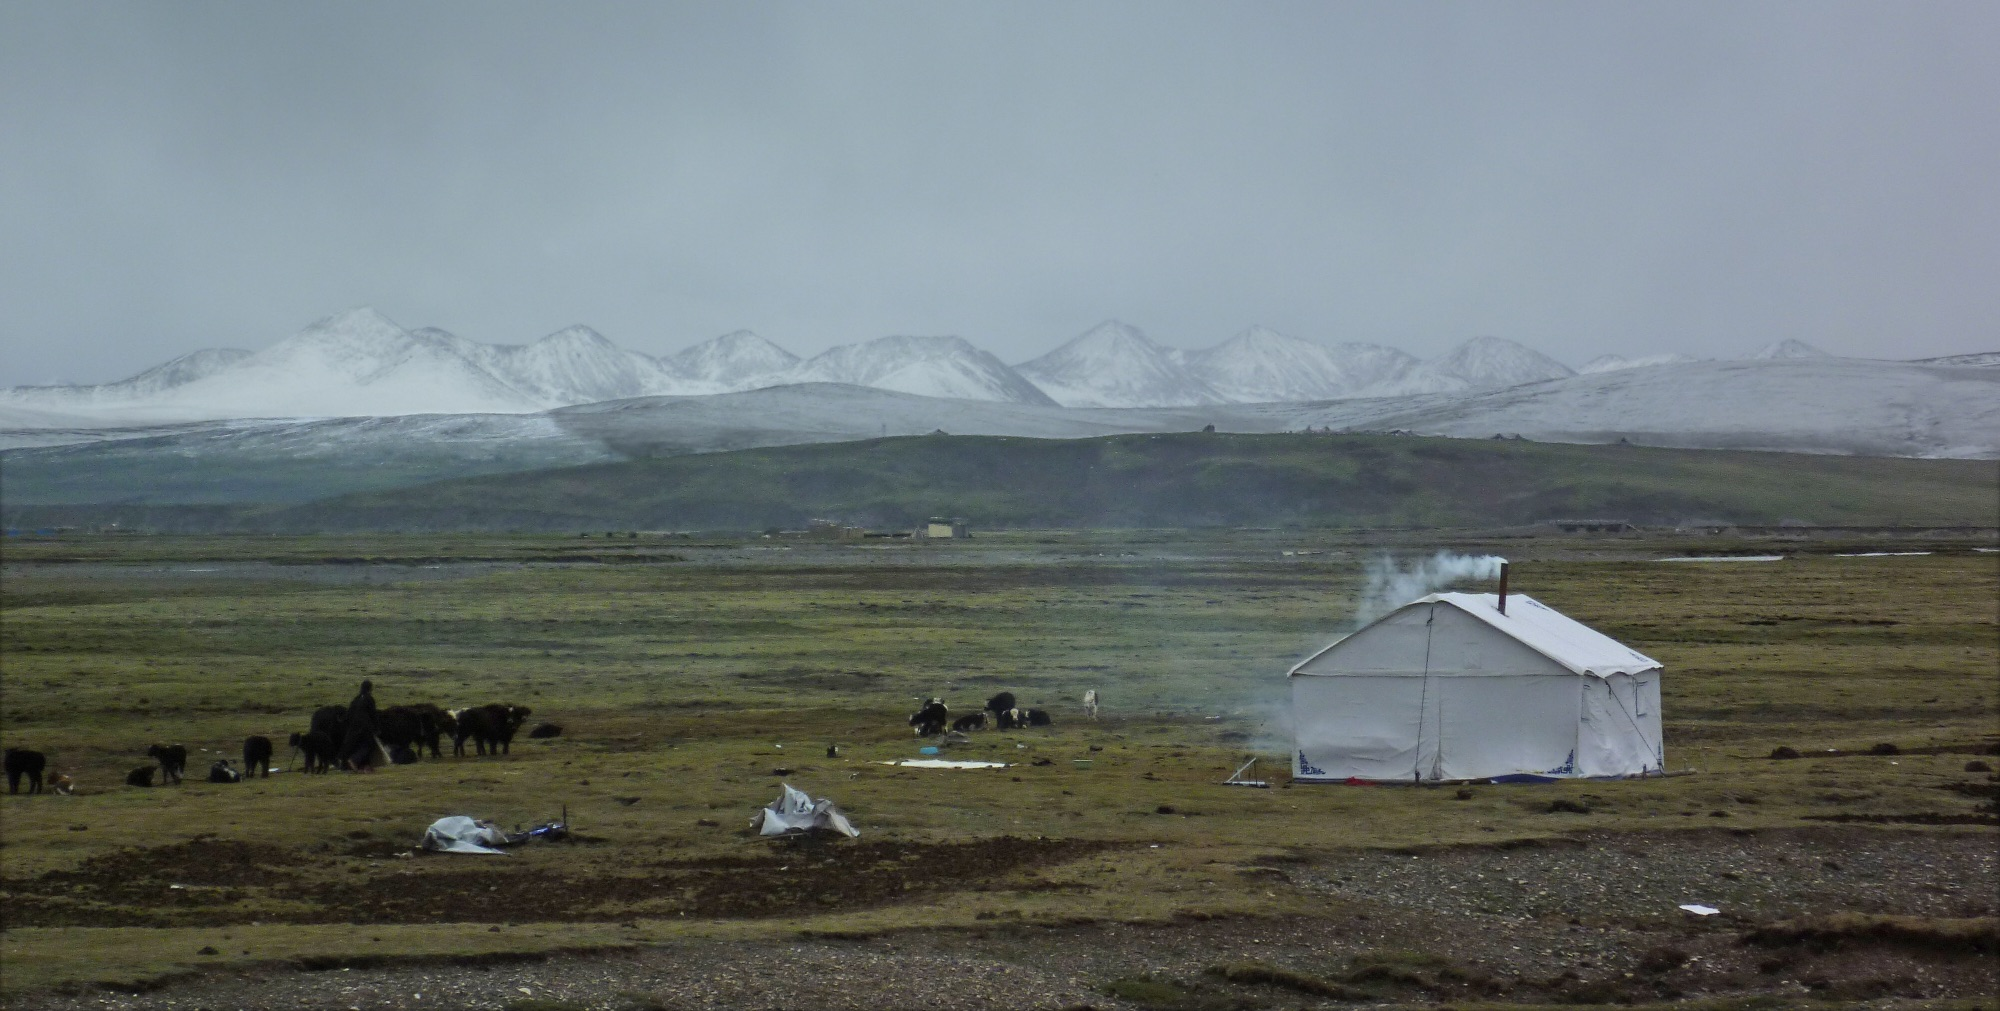 Tibetan Scenery 1